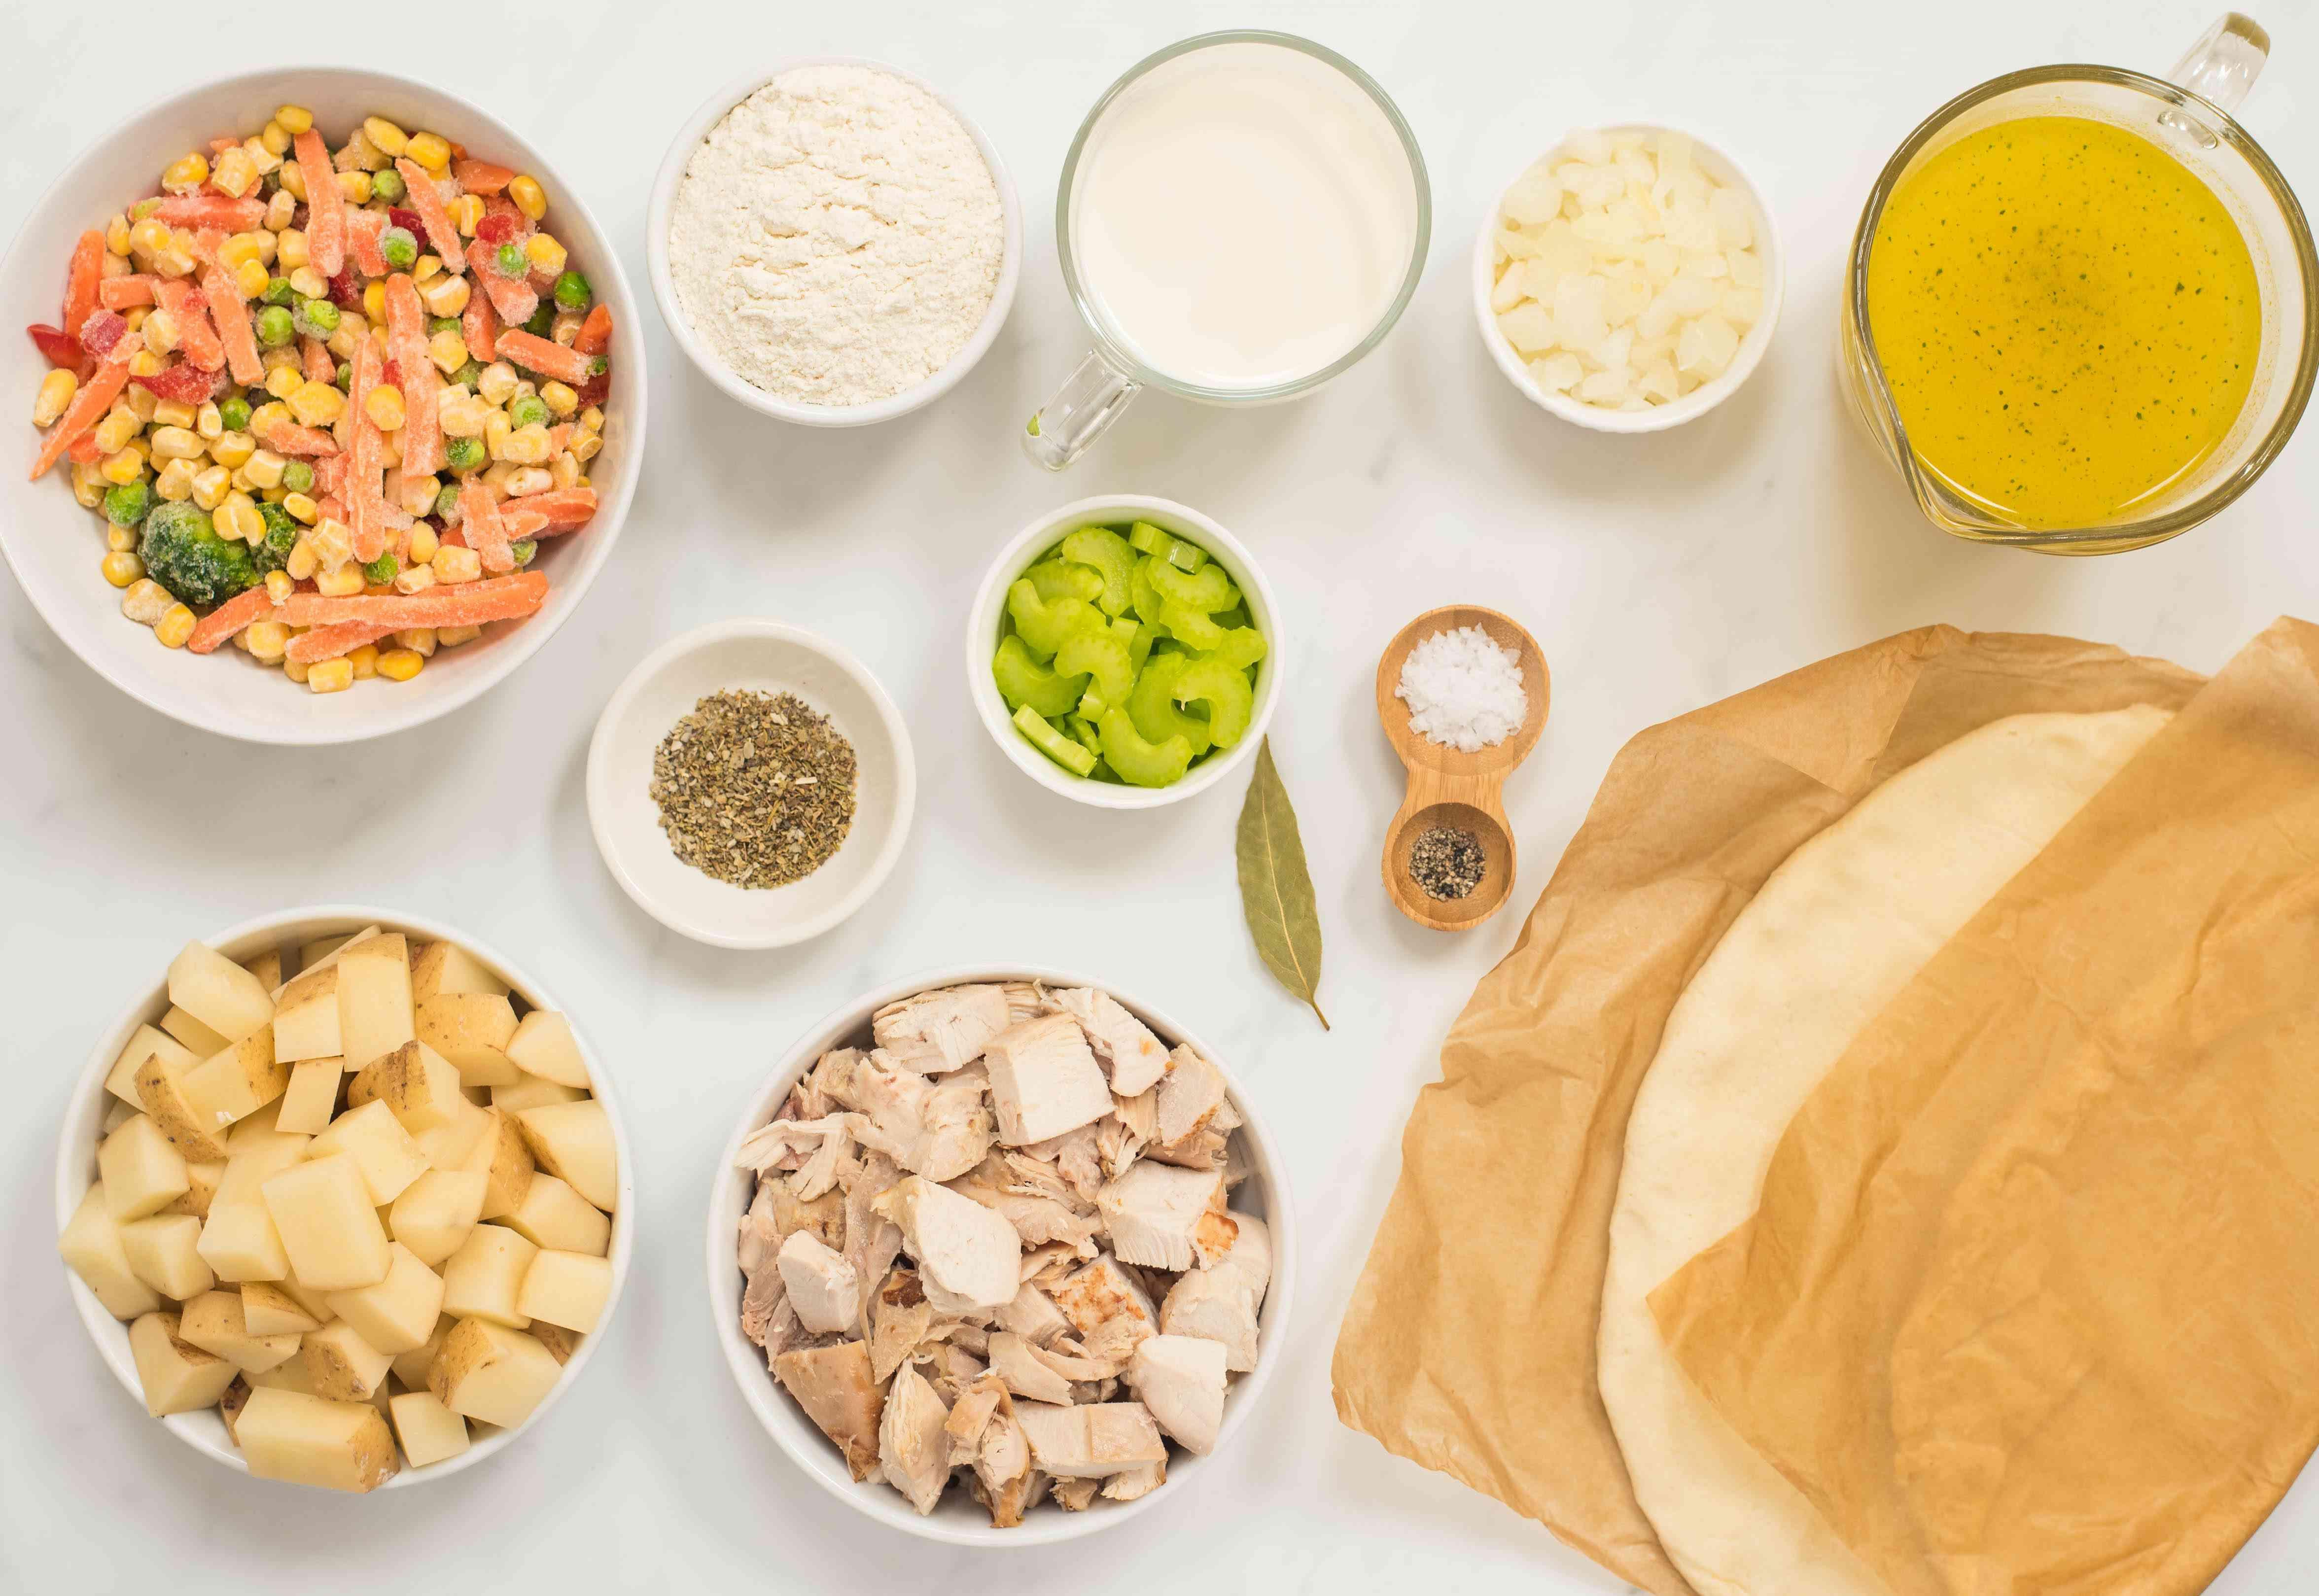 Ingredients for slow cooker chicken or turkey pie